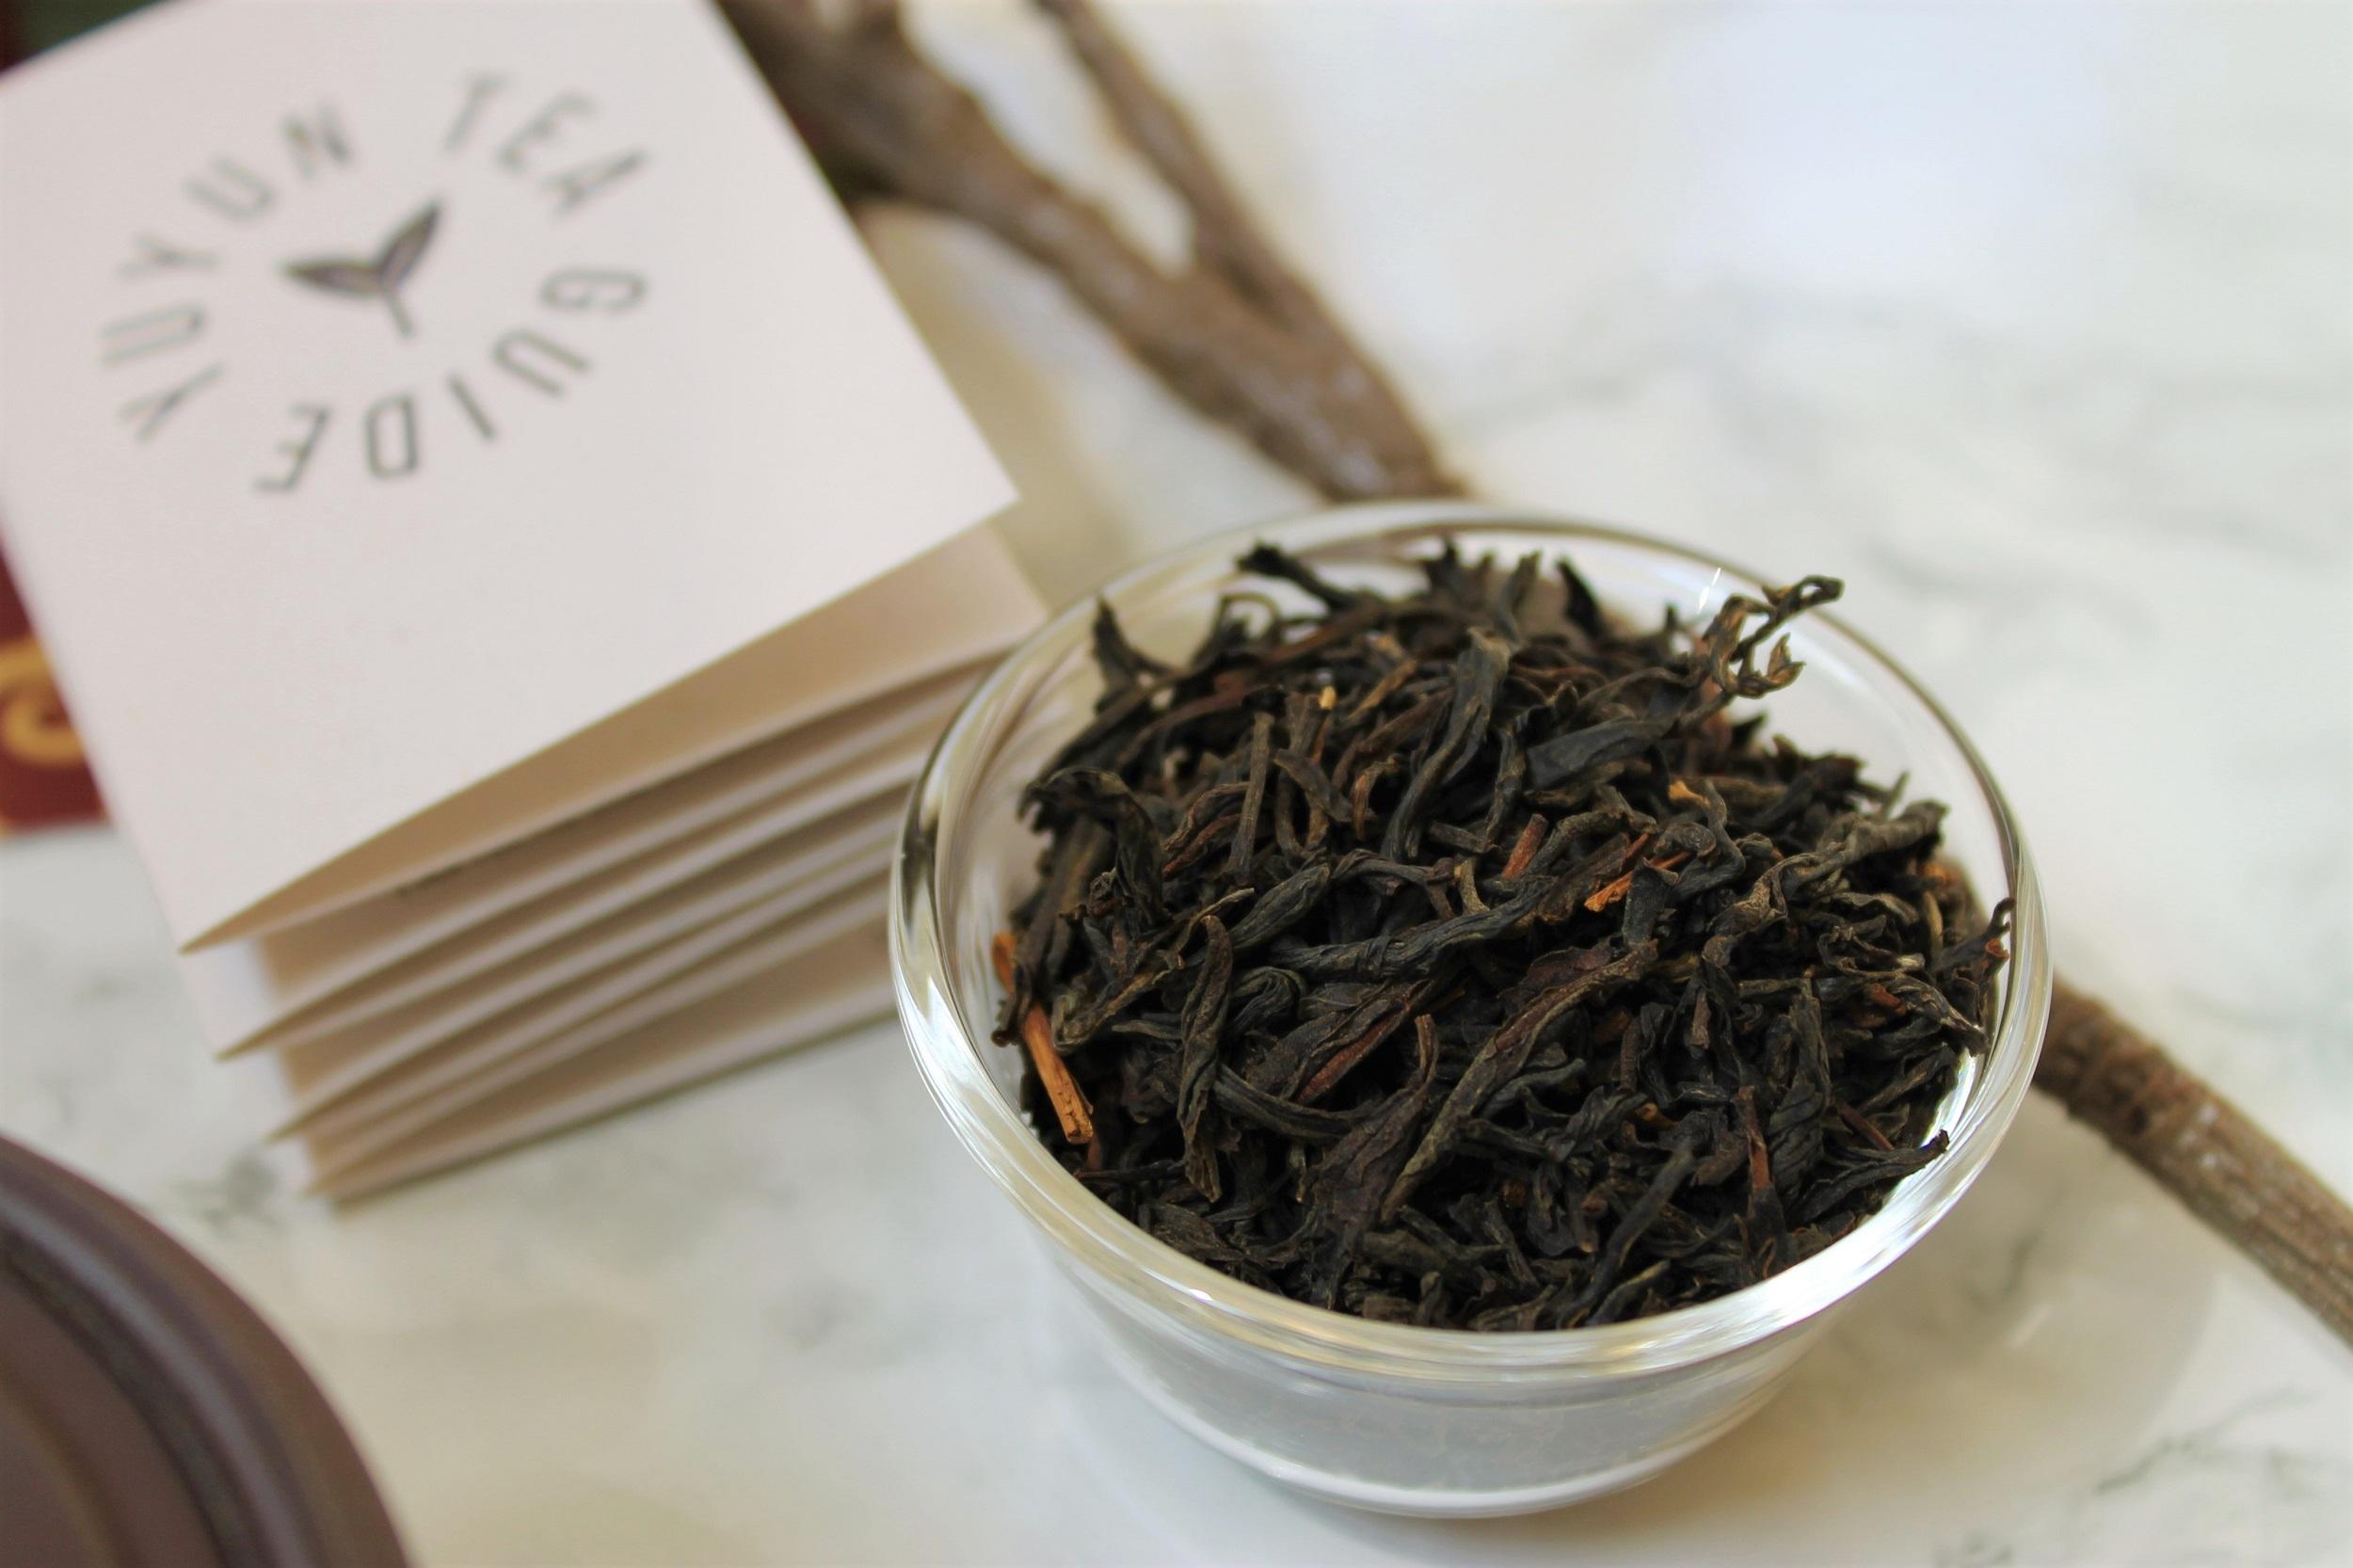 yunnan whole leaf black tea leaves